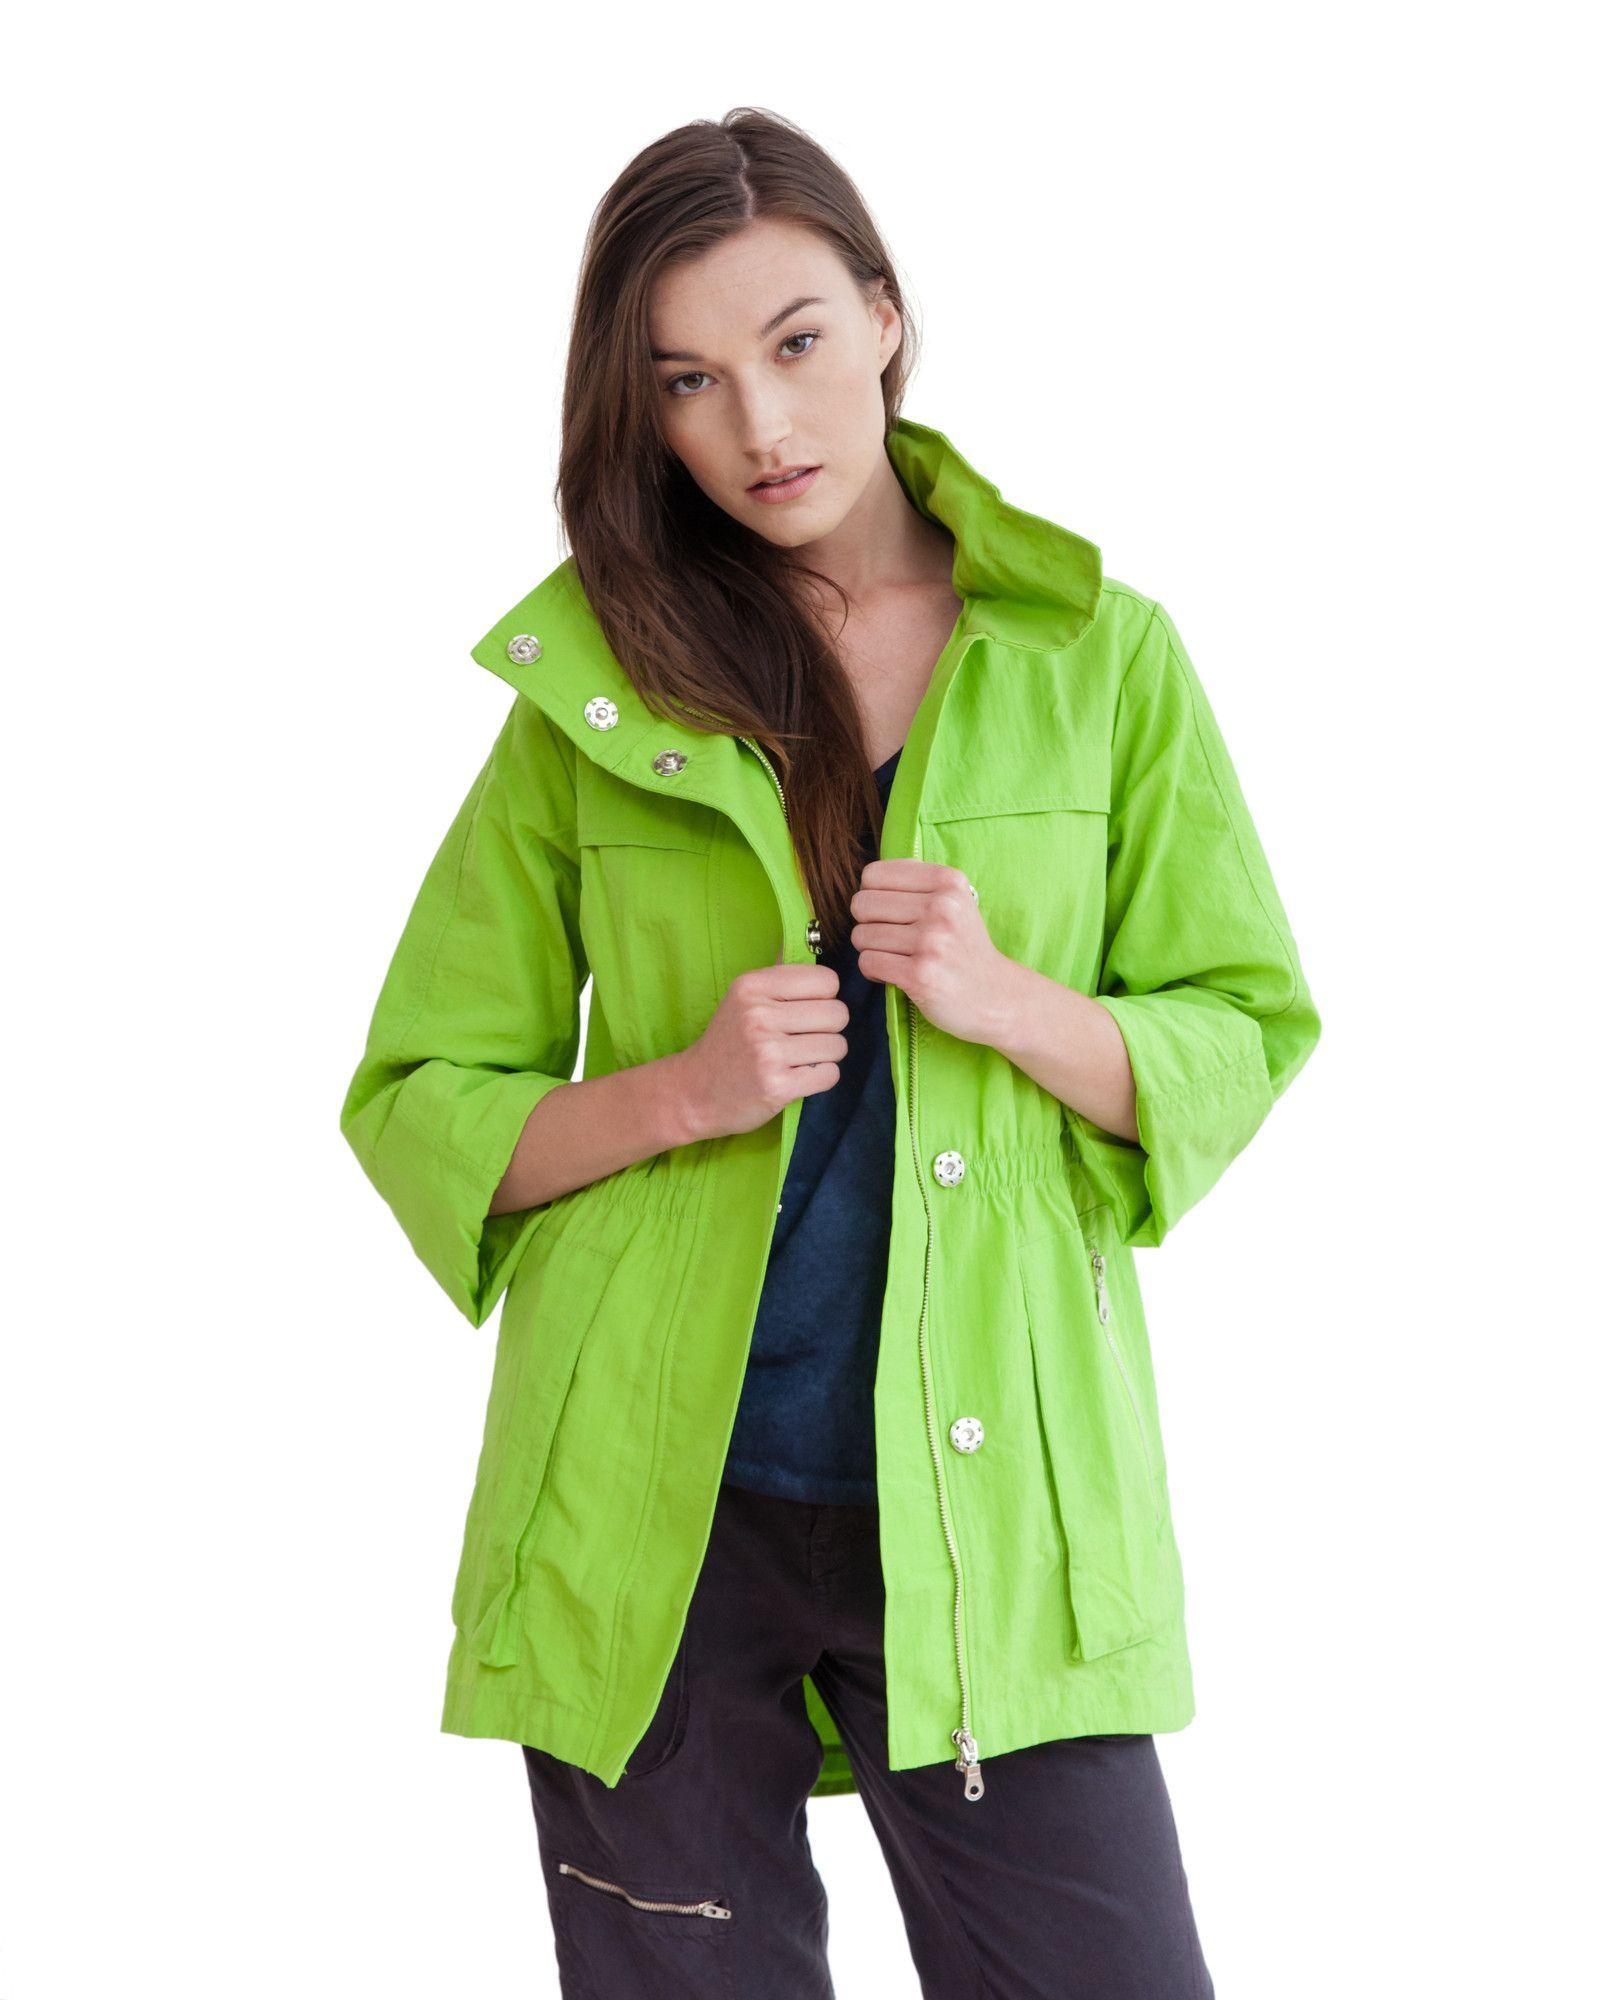 de5a3f3e07db6 The Anorak - Crinkle Nylon   A splash of color   Anorak jacket ...